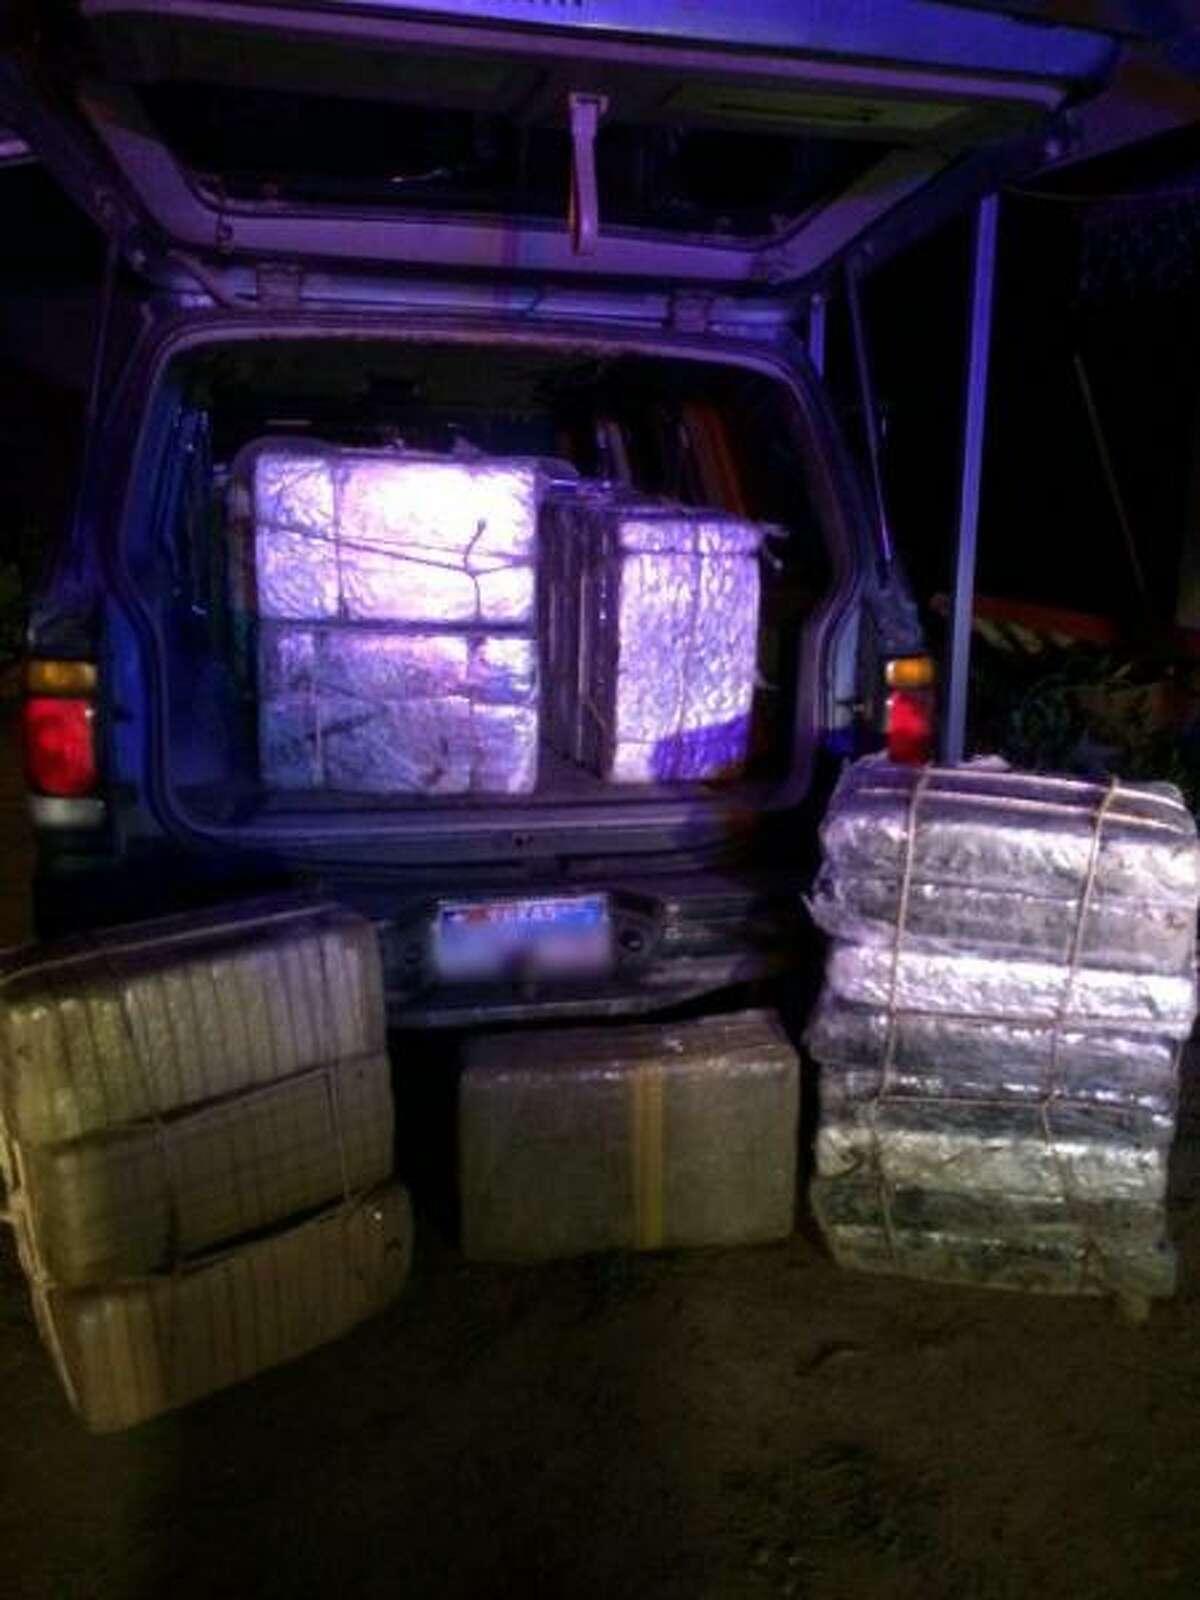 Drug: Marijuana Amount: 630 pounds Estimated value: $504,000 Date: Jan. 2, 2015 Location: Escobares Details: Agents found the marijuana bundled in 28 bricks in an abandoned 1999 Ford Explorer.